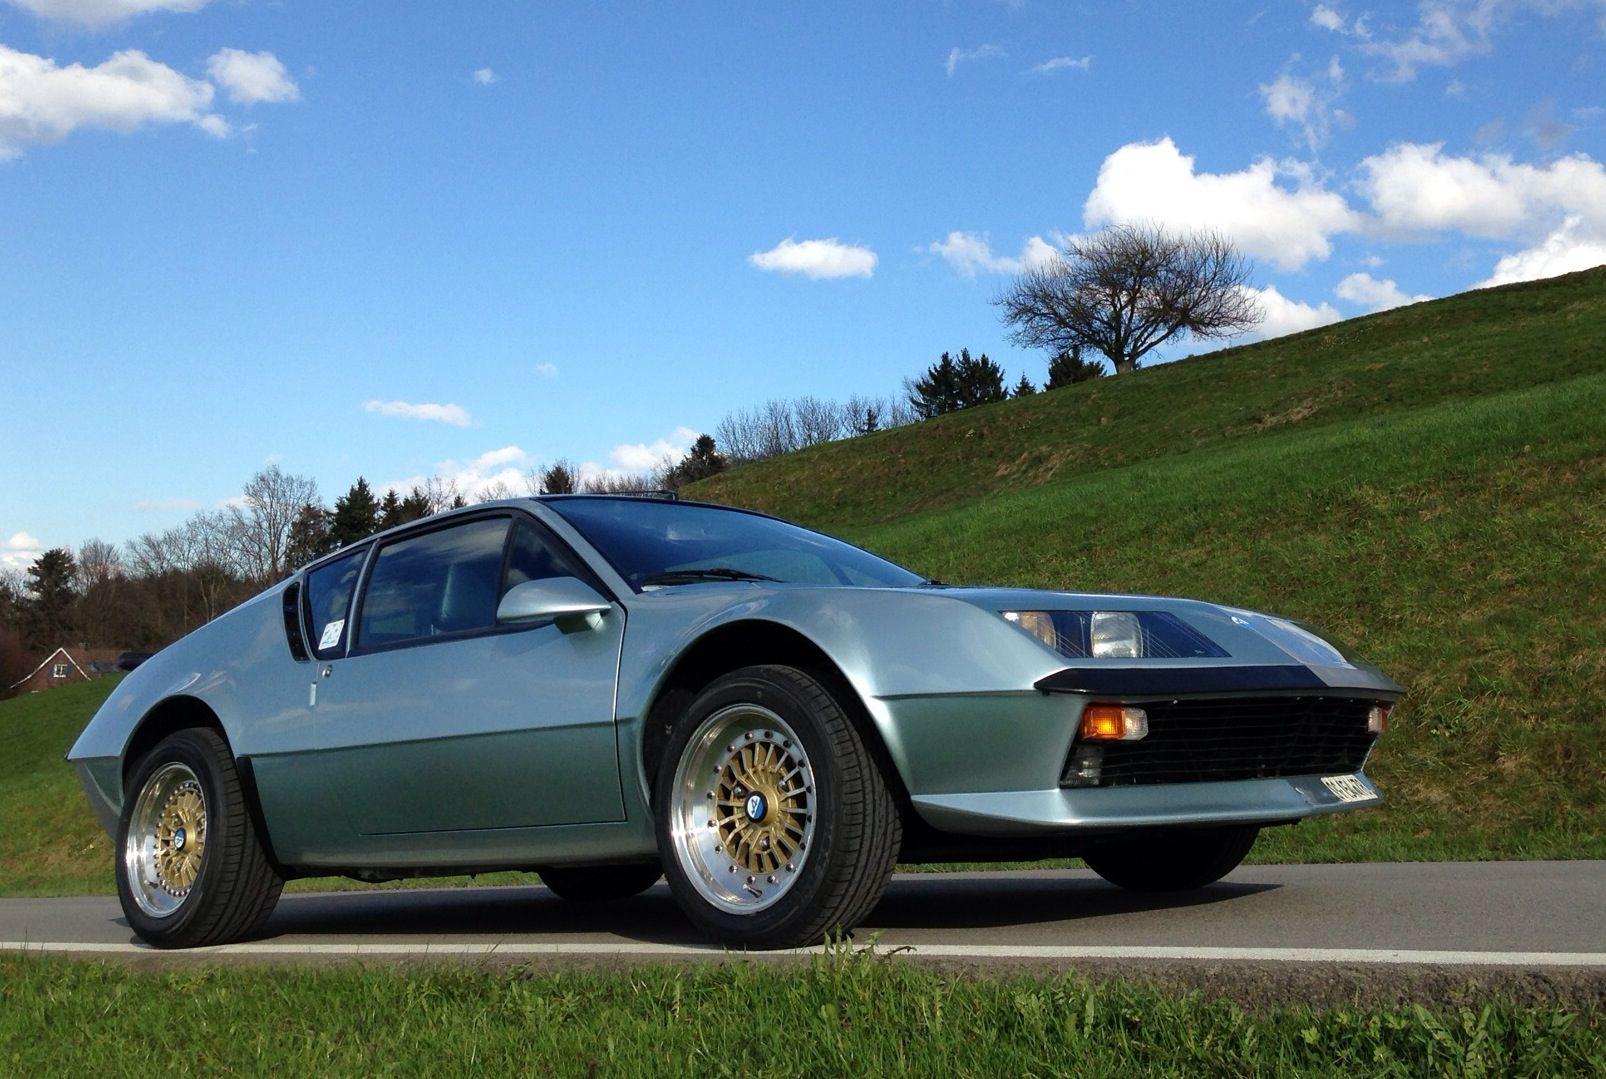 Alpine 310 V6